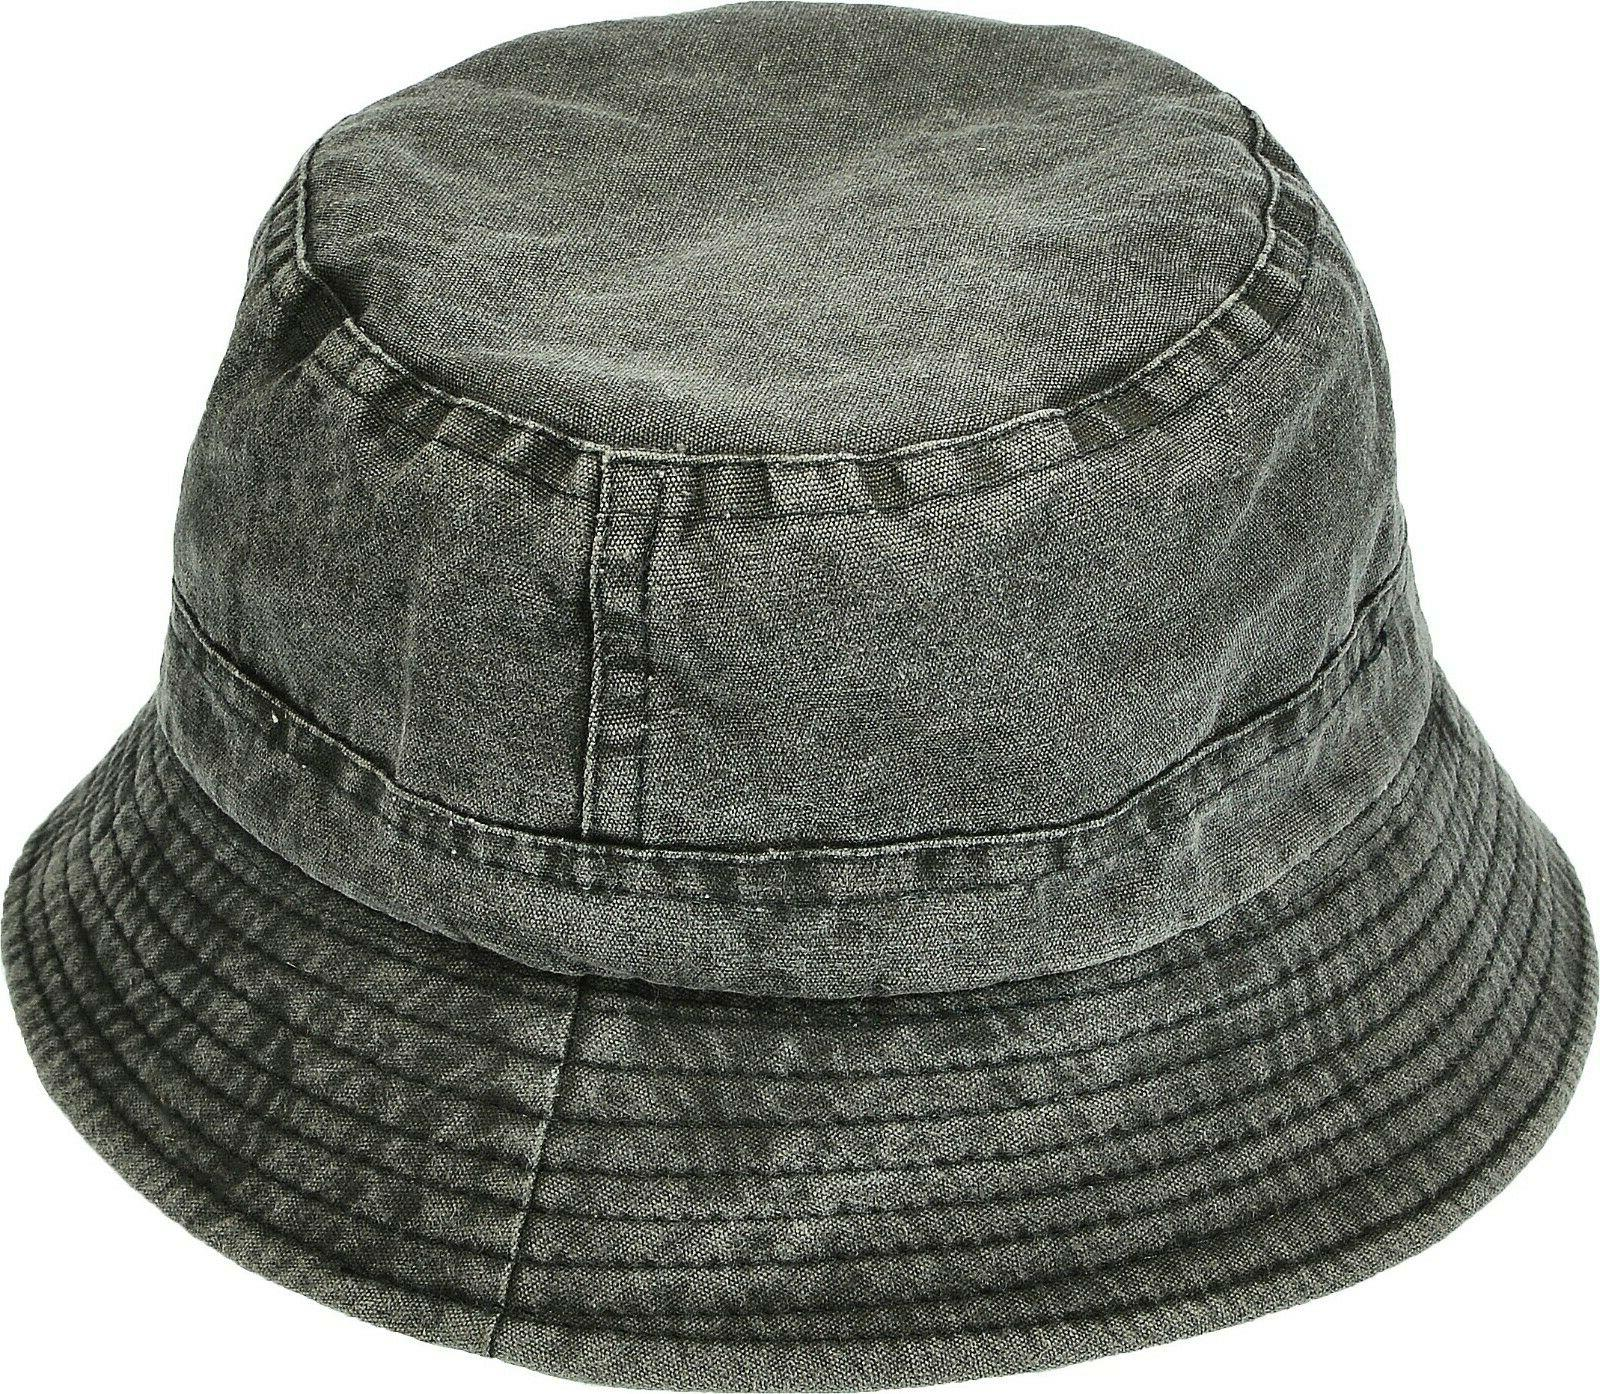 unisex washed cotton denim bucket hat packable